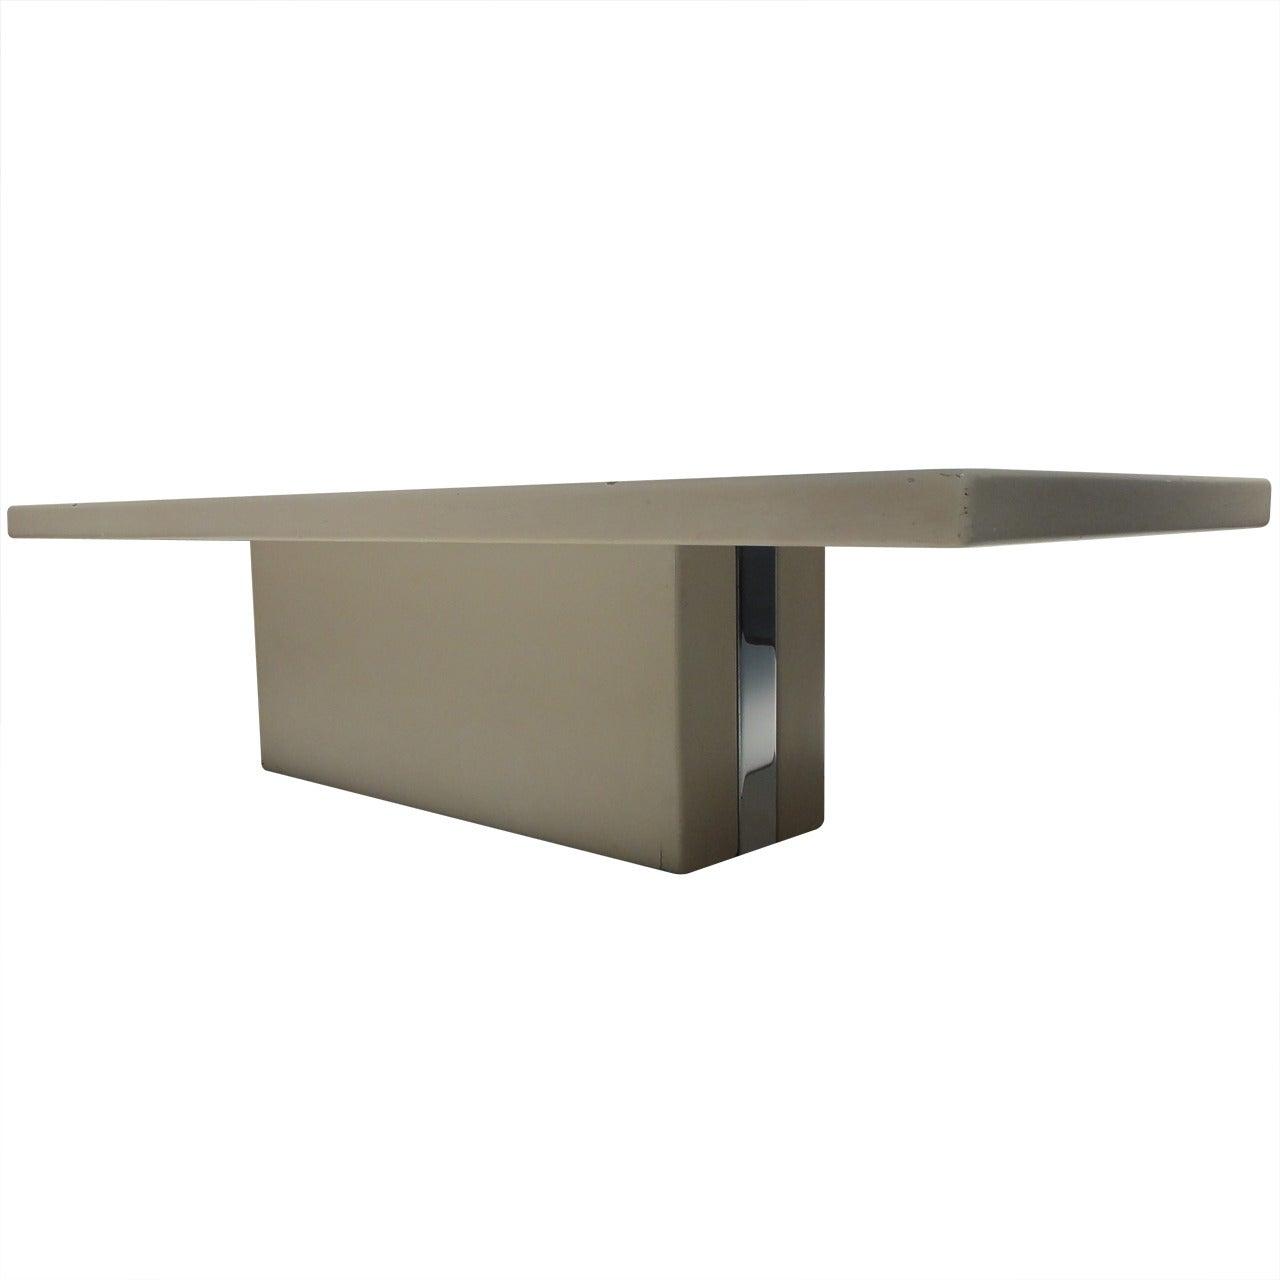 Rare coffee table by italian architect Lorenzo Forges Davanzati, 1961,published